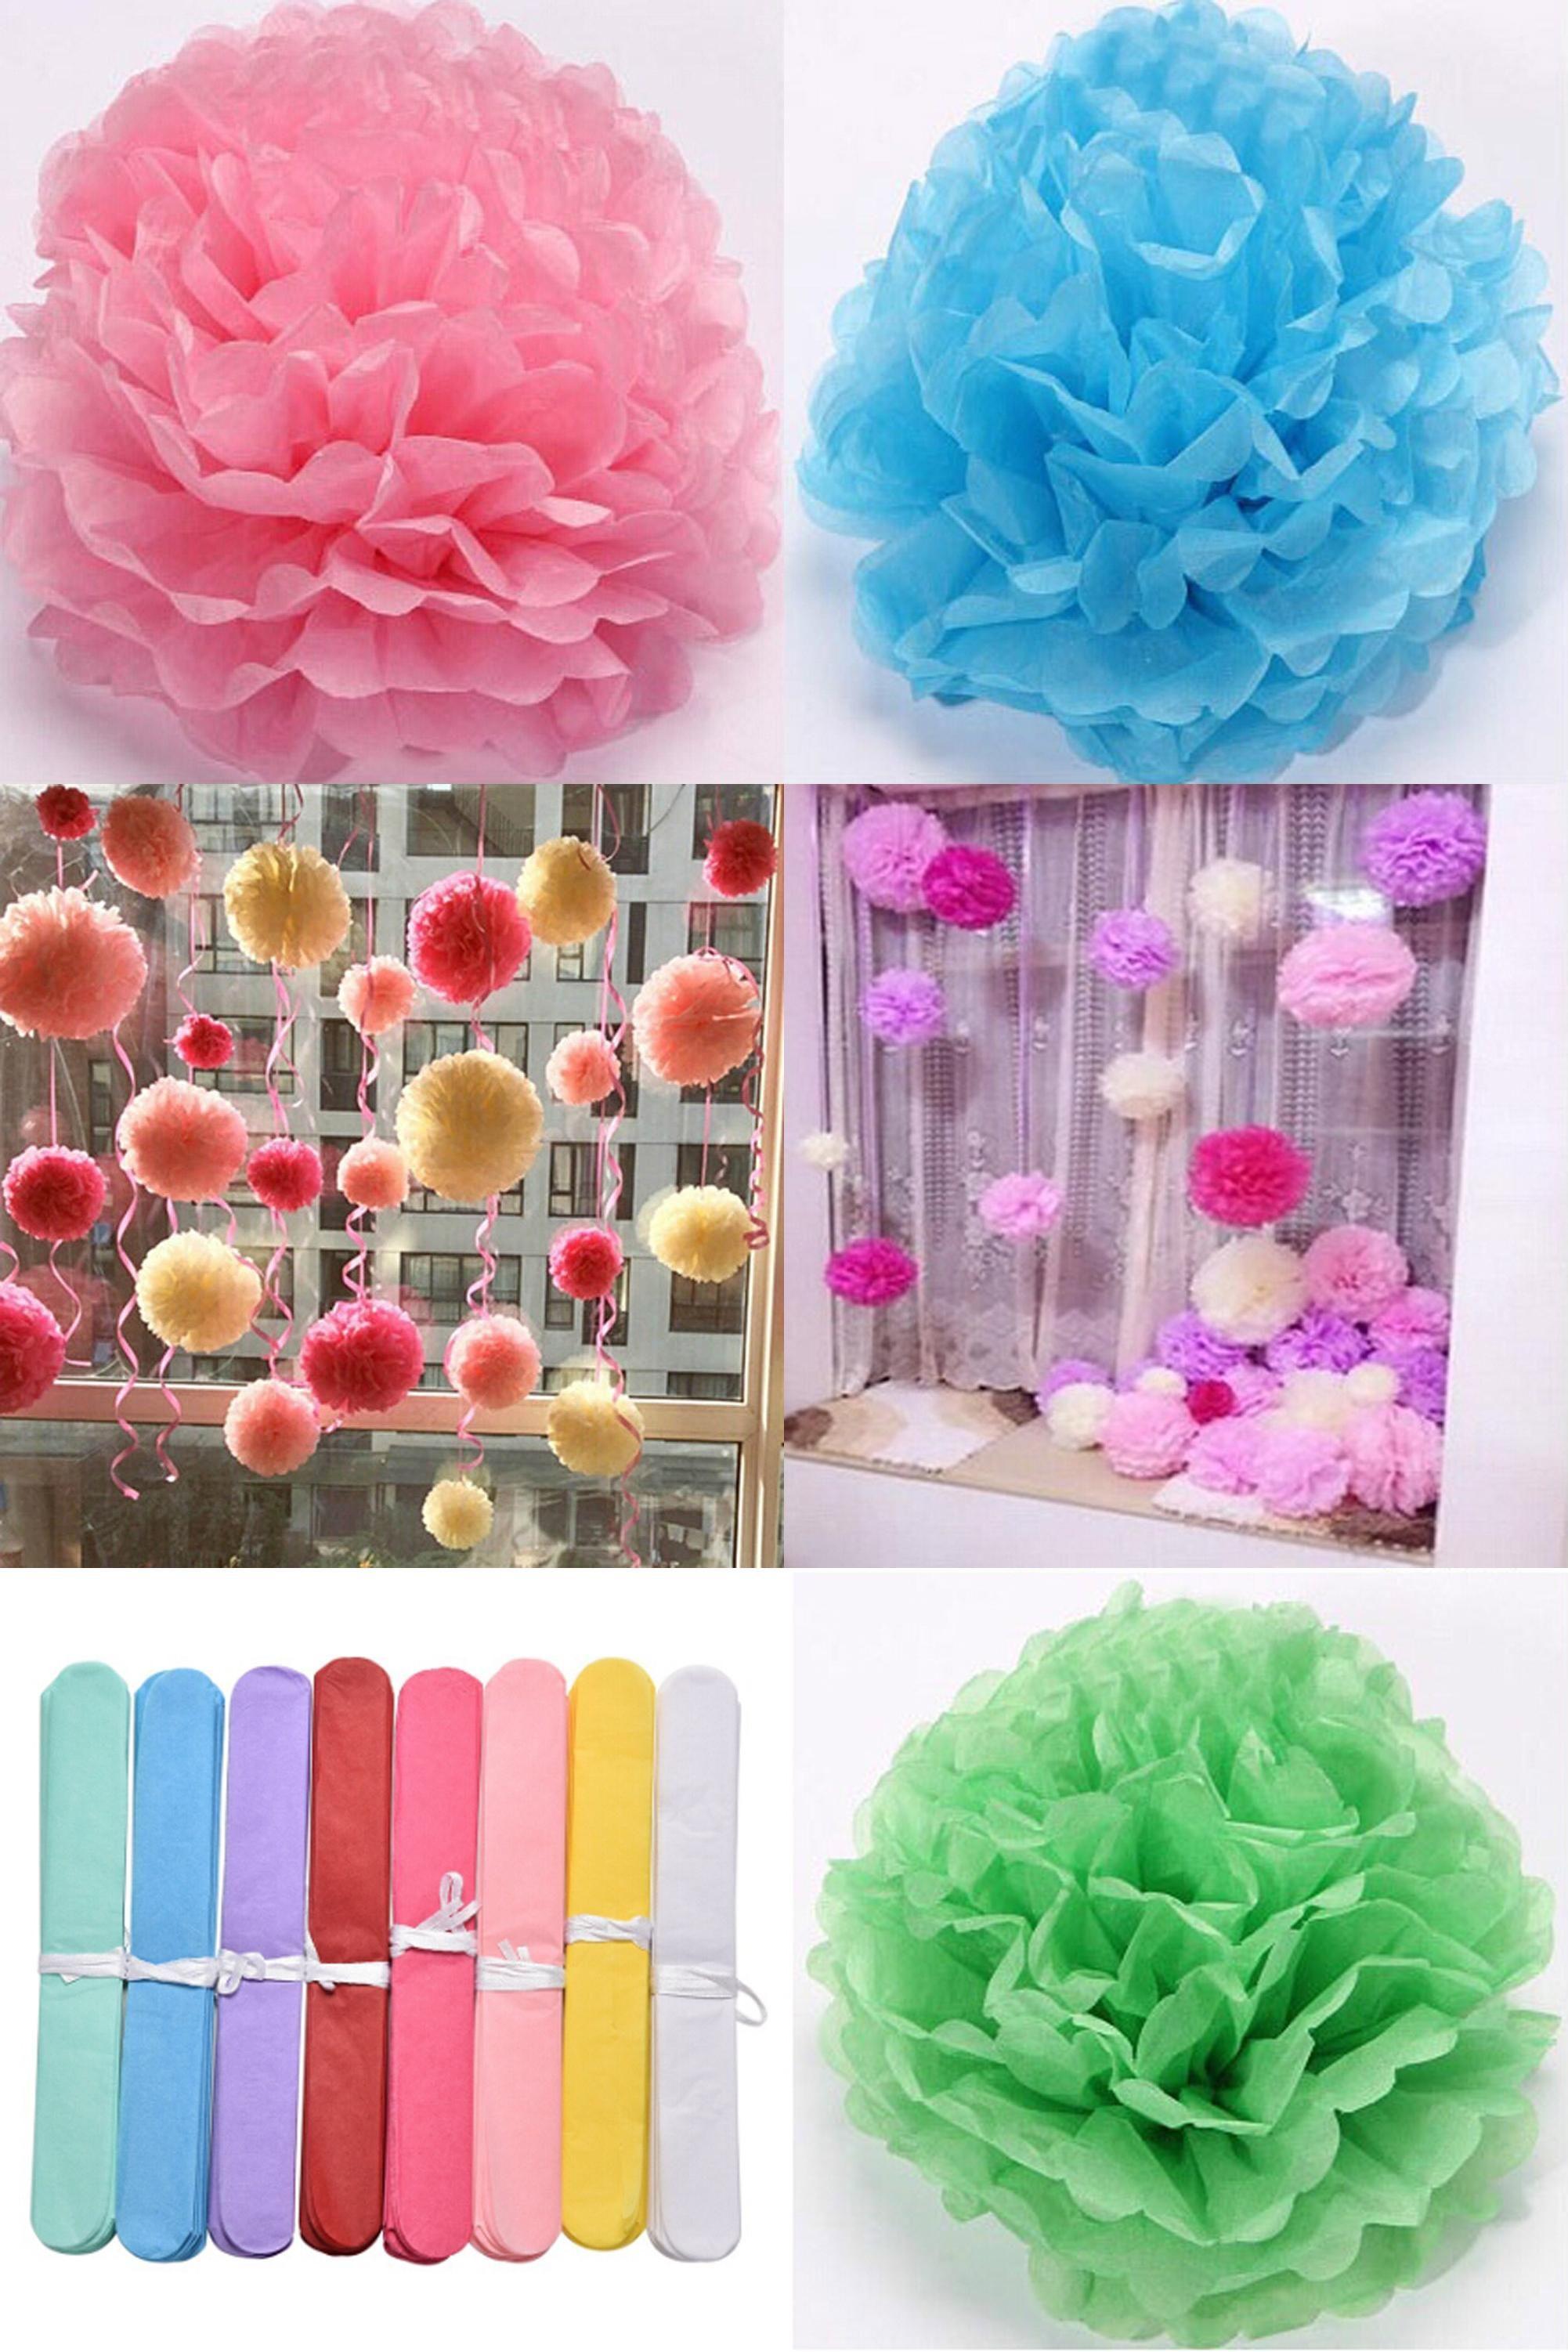 Visit To Buy 20cm Paper Flowers Ball Diy Wedding Birthday Ornaments